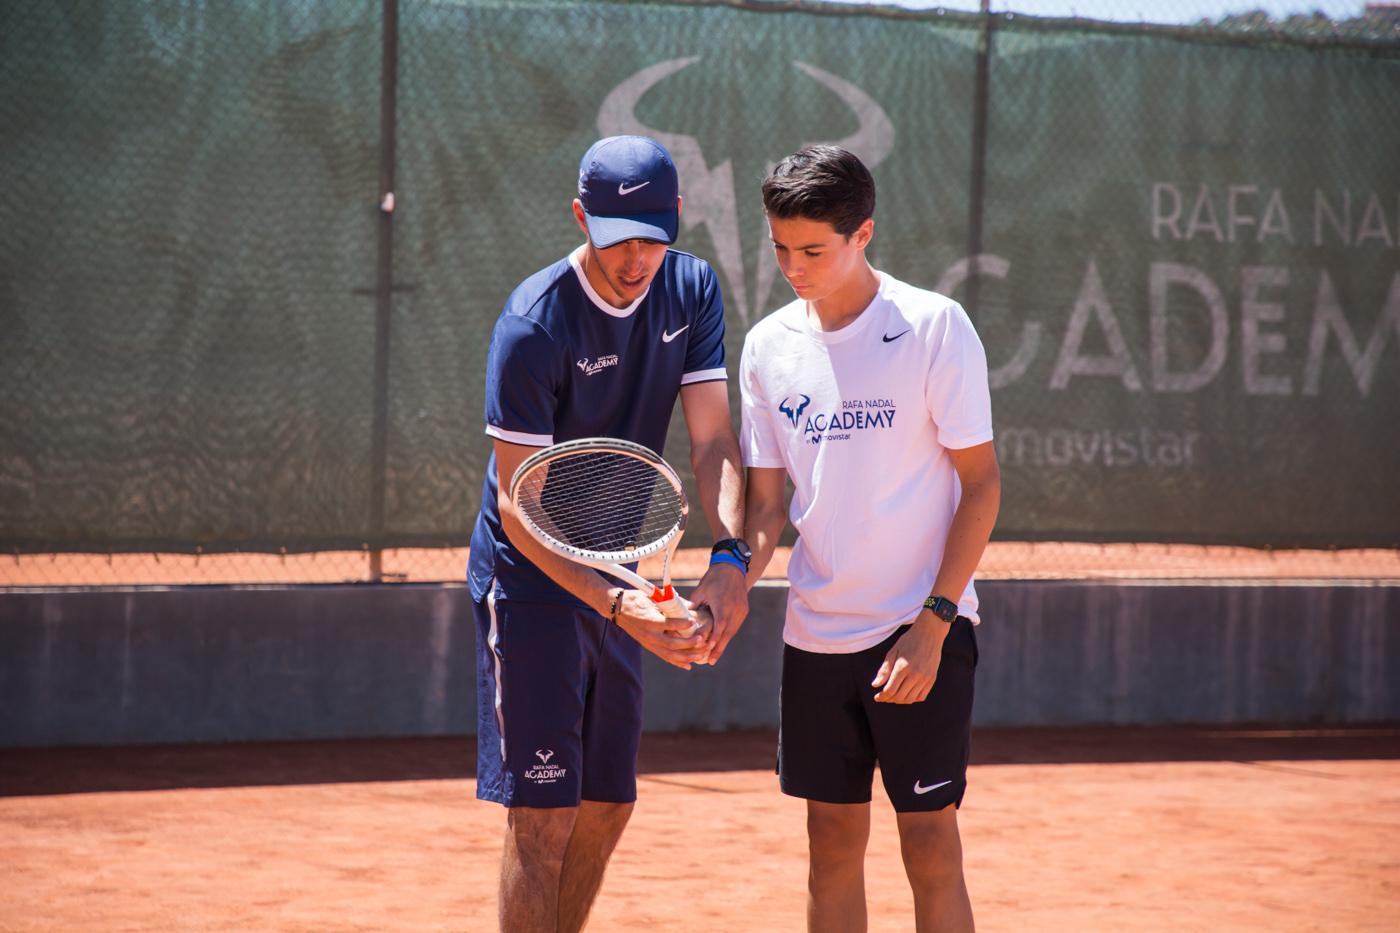 Rafa Nadal Tennis Centre | Rafa Nadal Academy